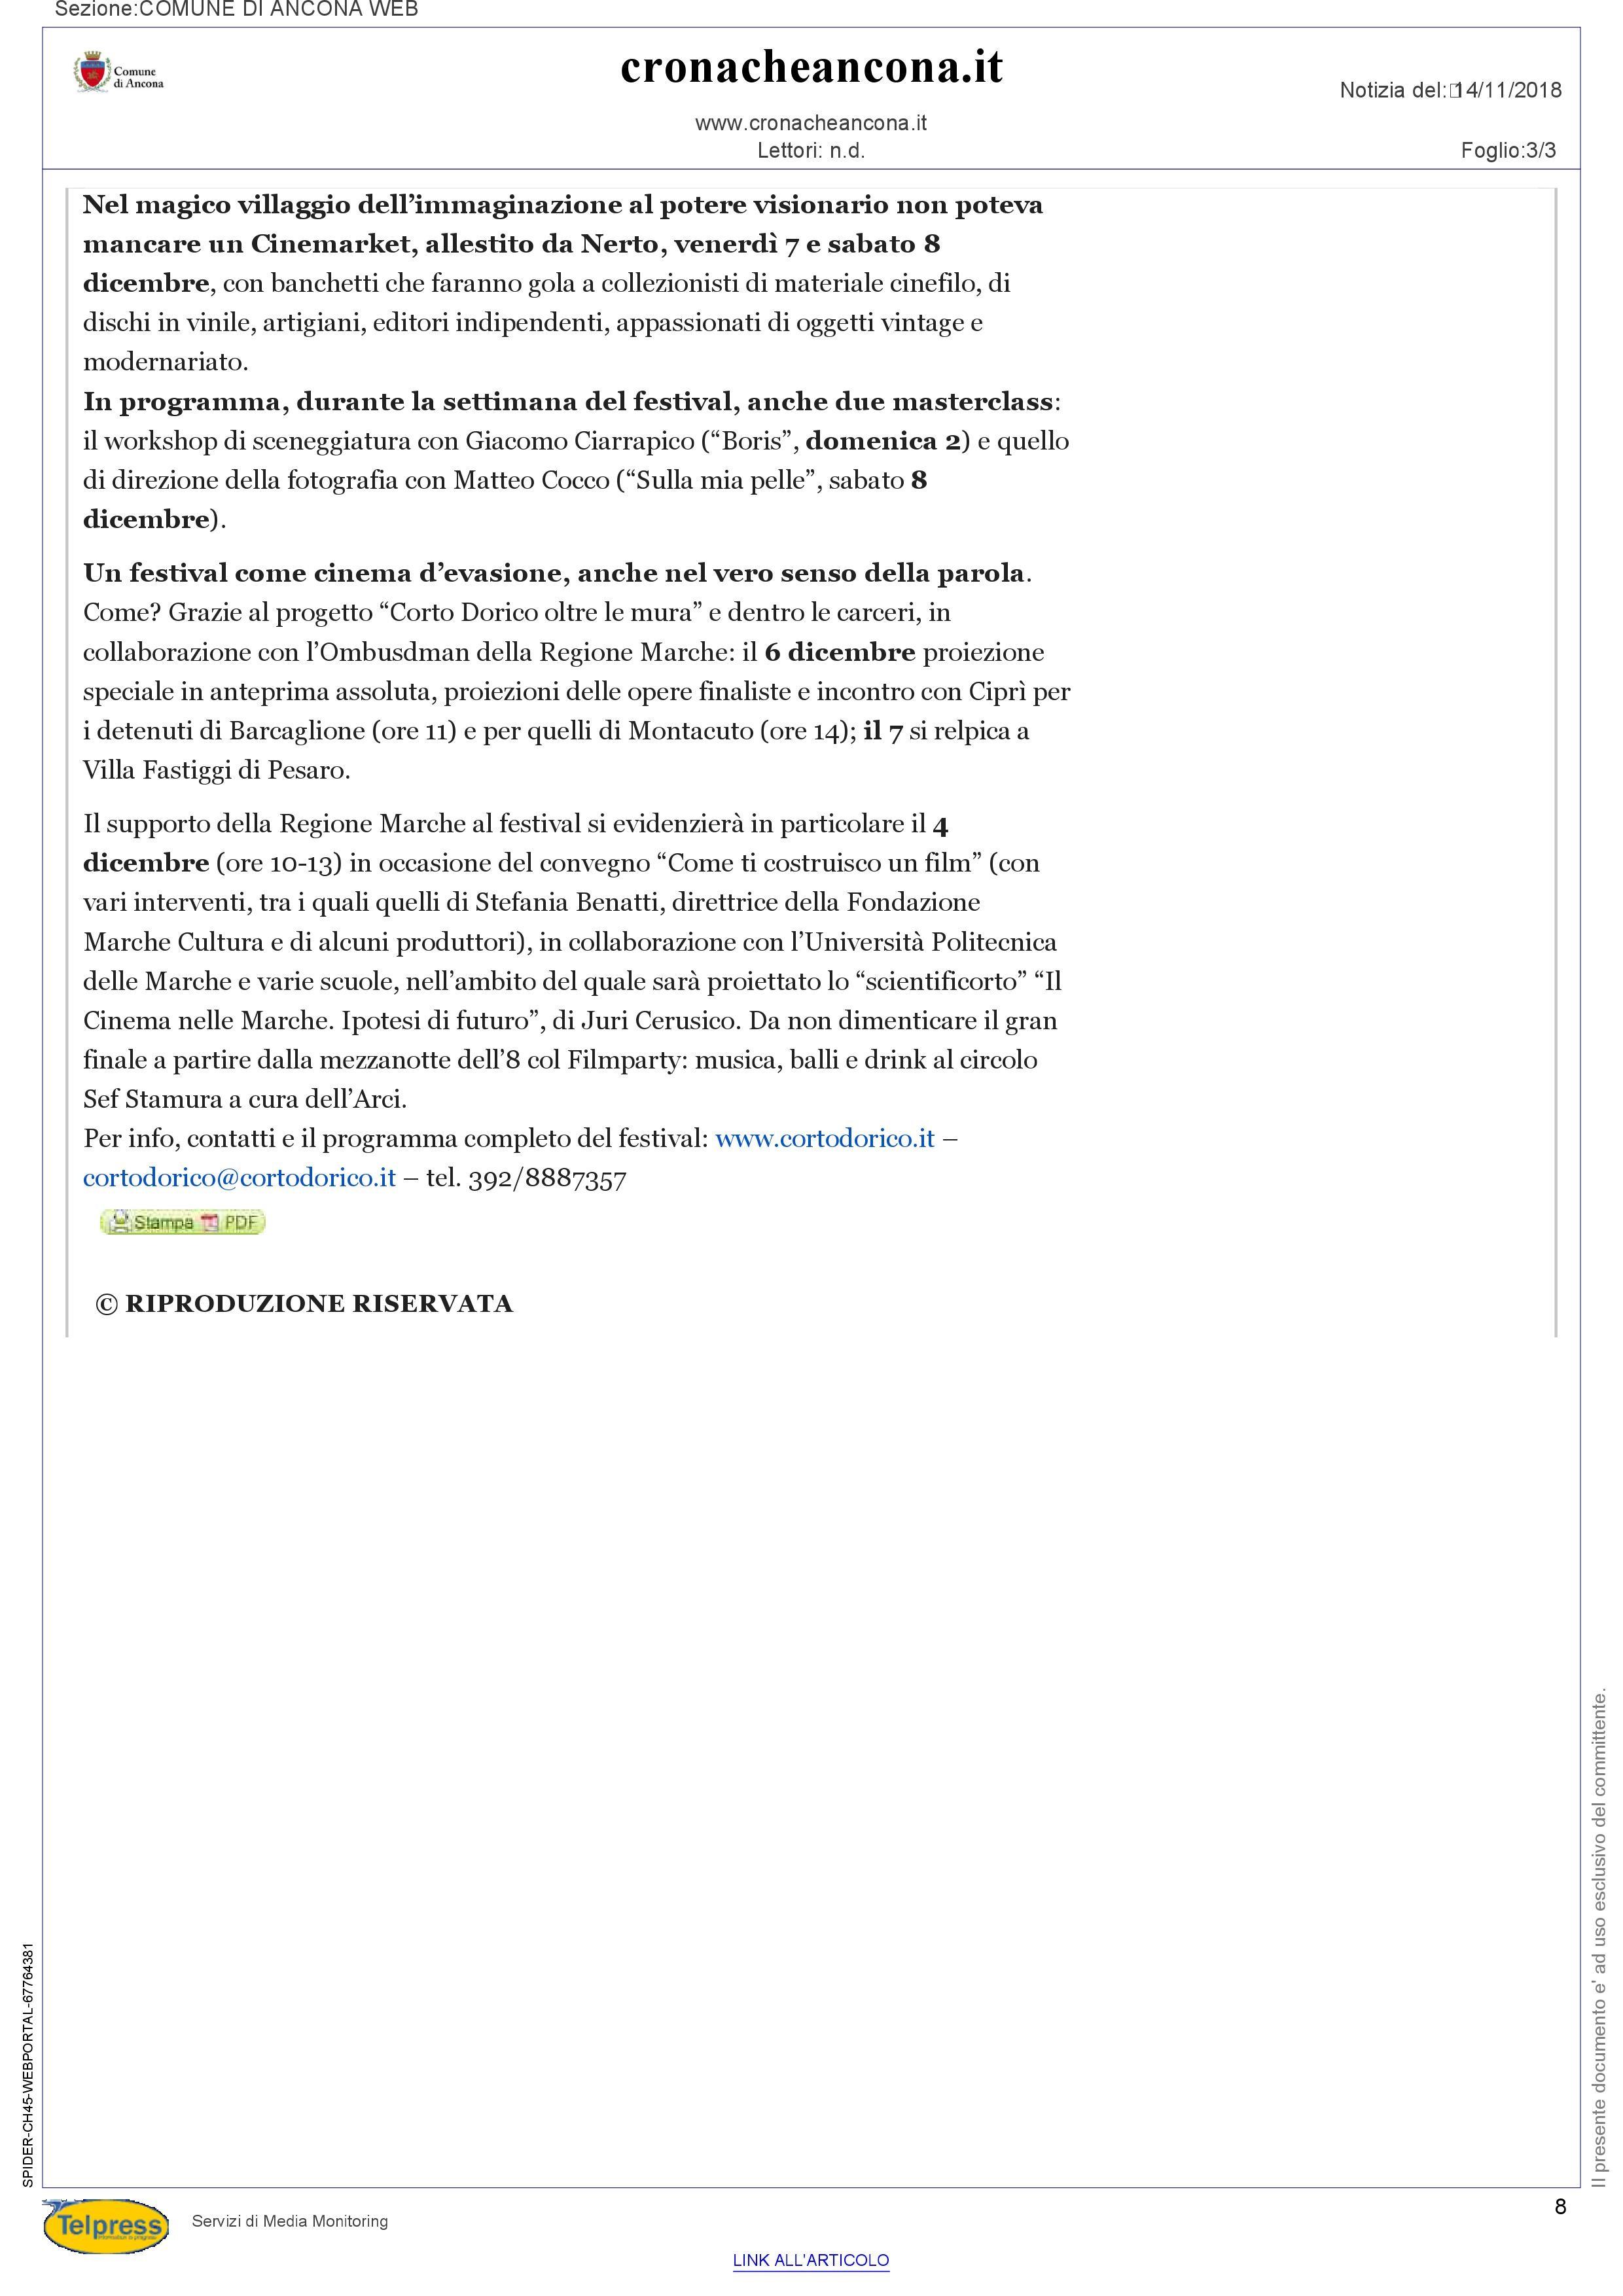 14-11-18 Cronache Ancona pag 3